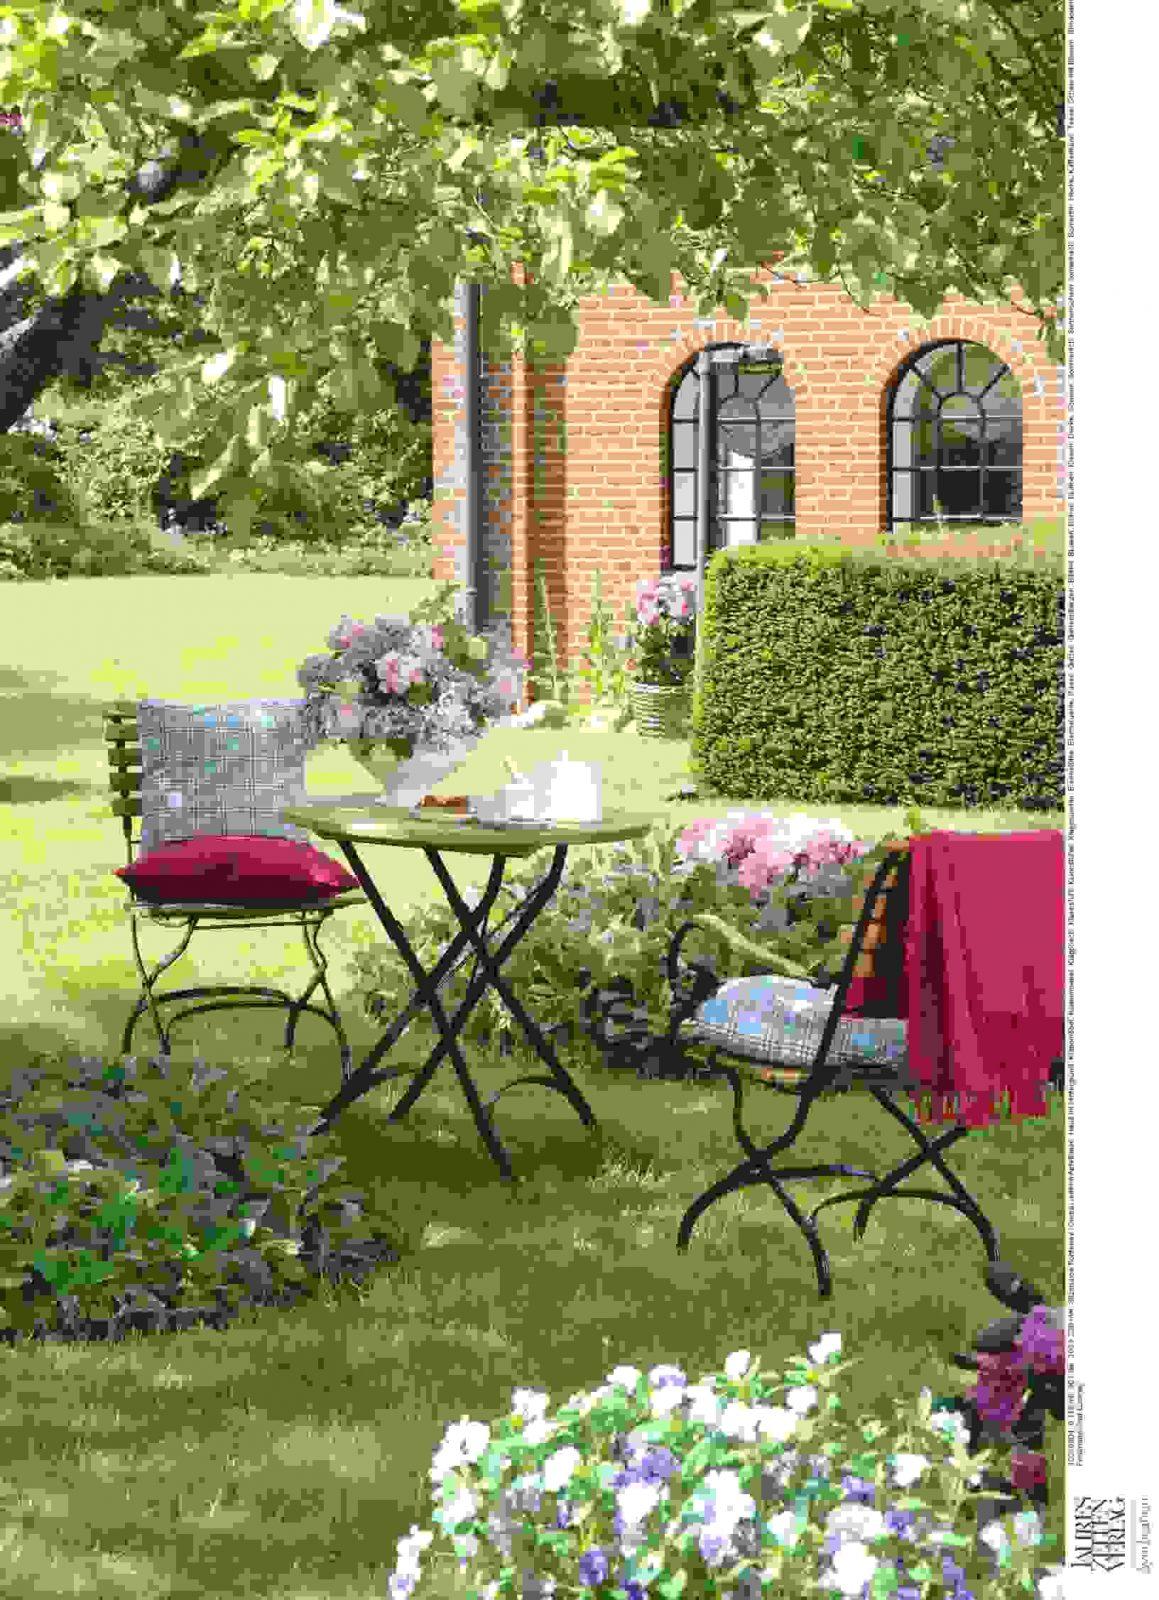 dekorationen luxus sitzecken im garten garten sitzecke selber bauen von sitzecke garten selber. Black Bedroom Furniture Sets. Home Design Ideas